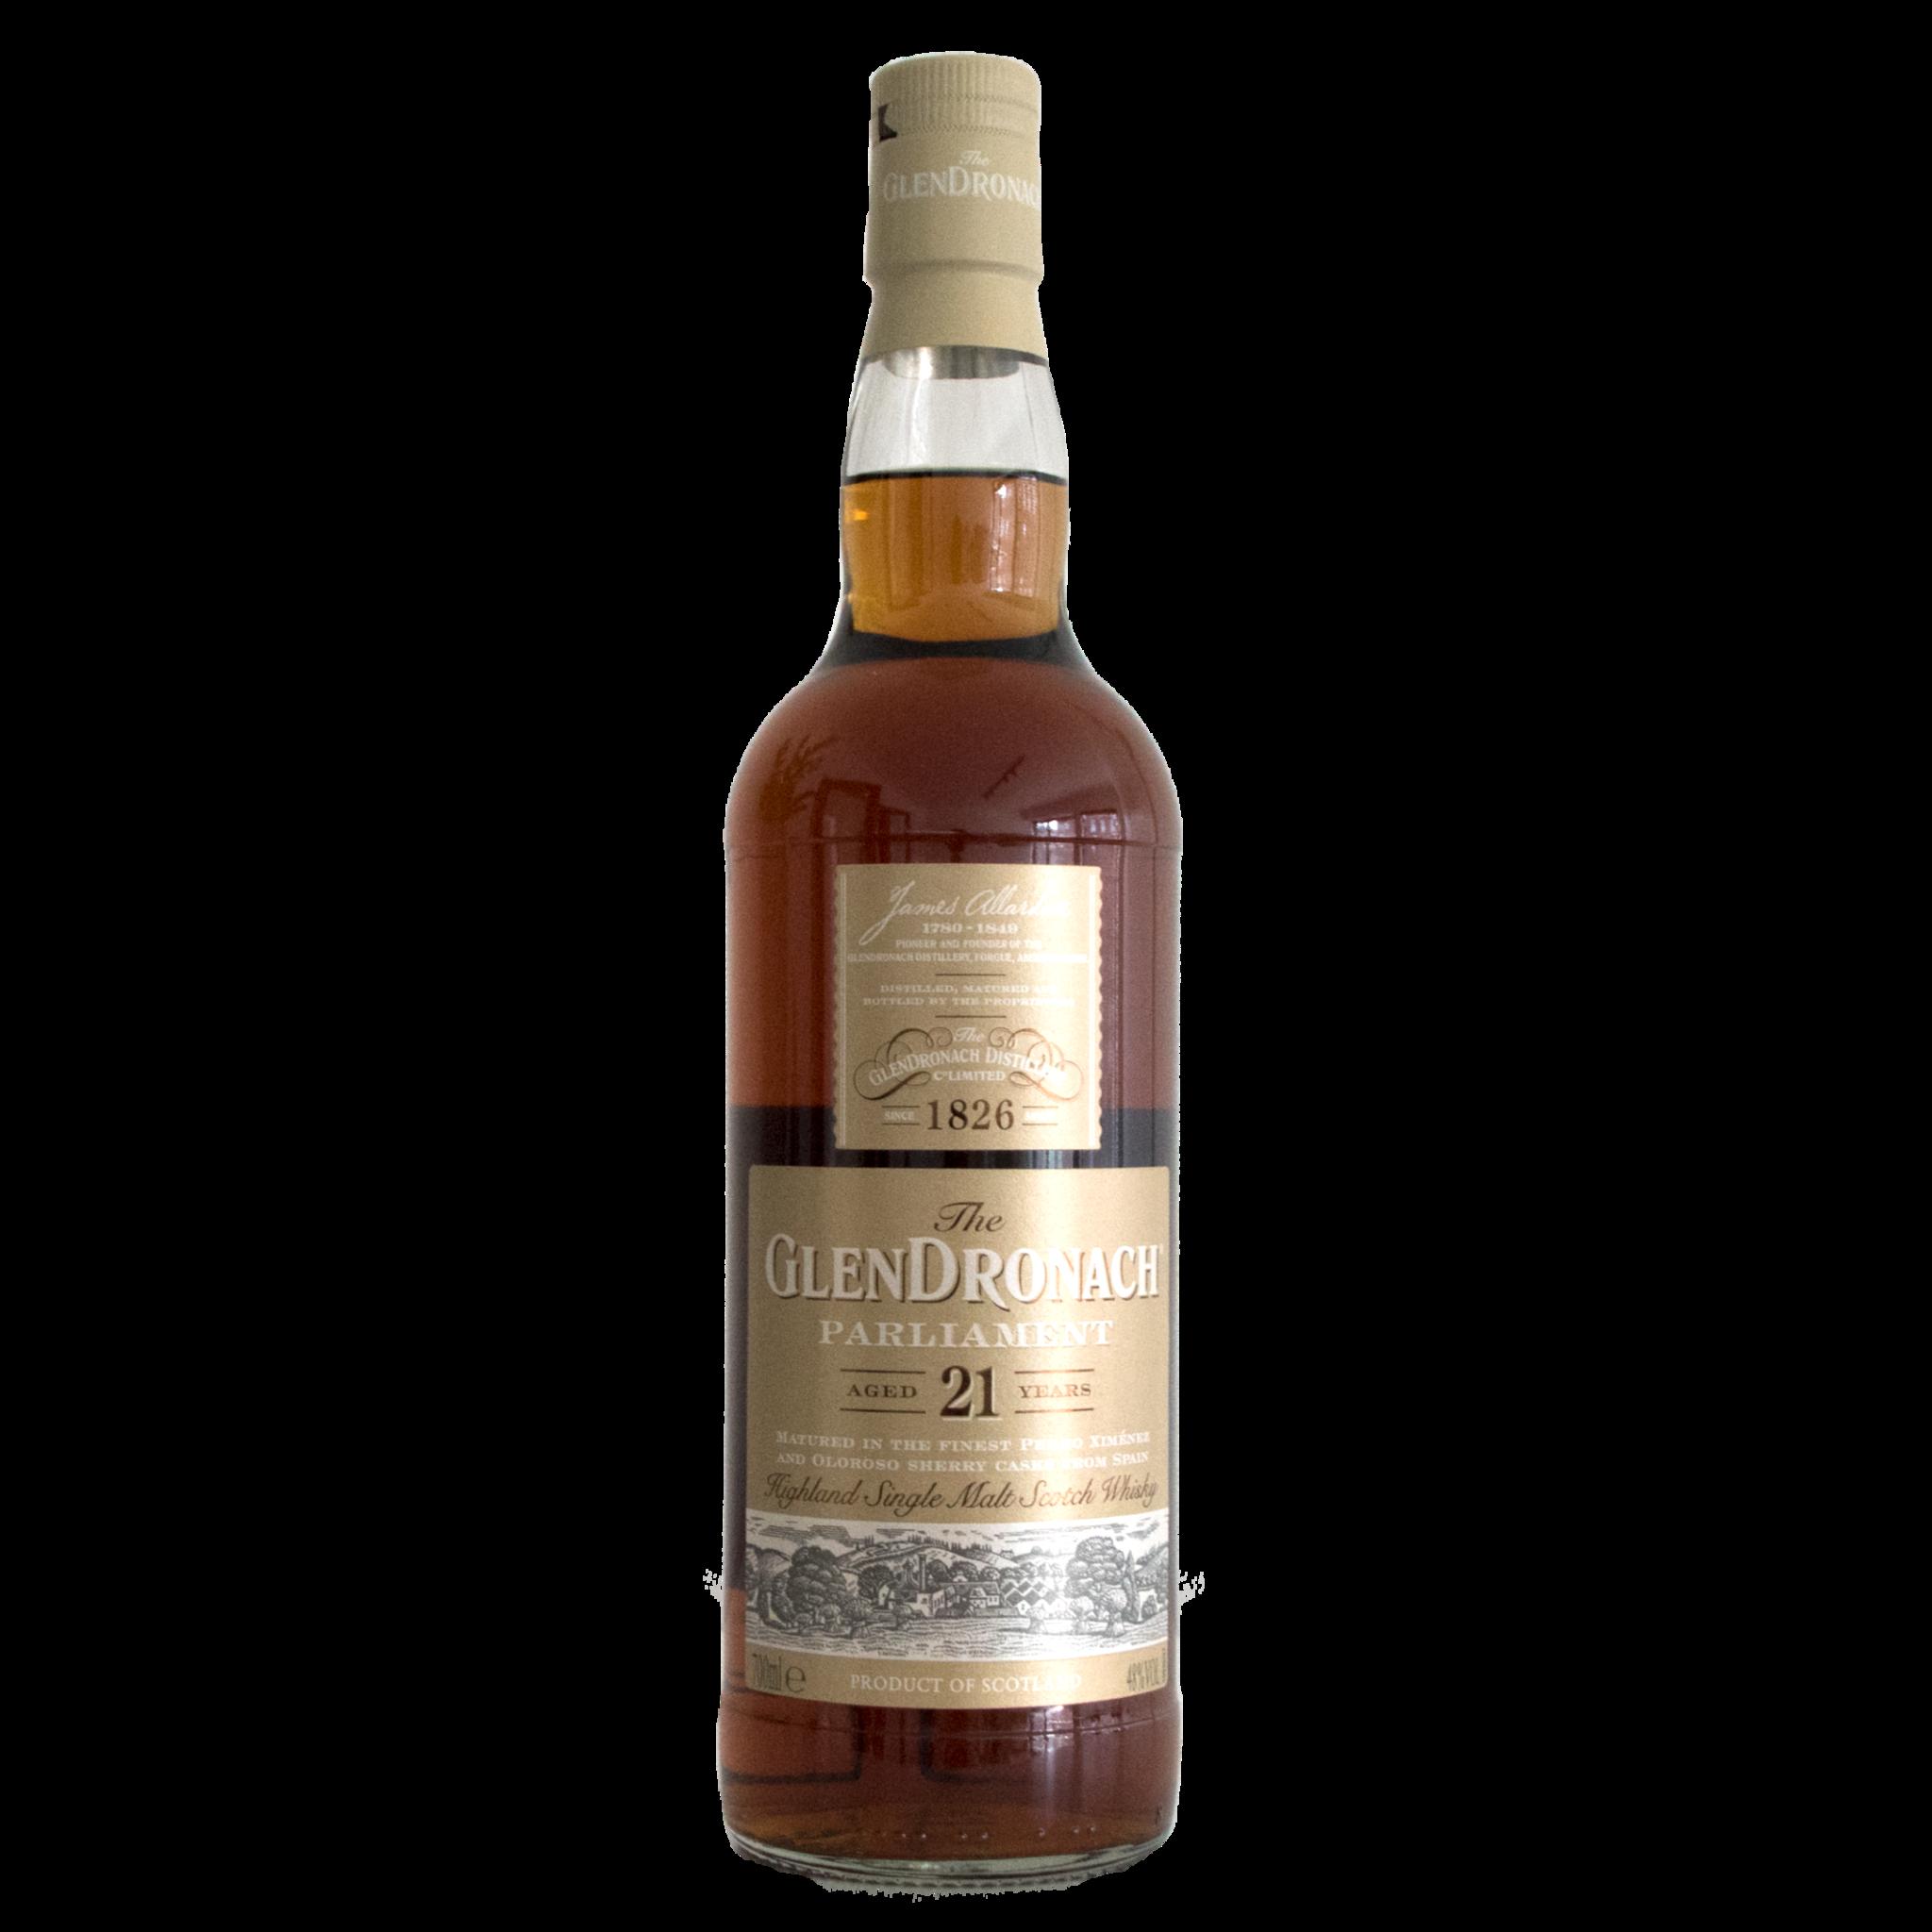 Glendronach Distillery Glendronach 21y, Parliament, 48%, 70cl